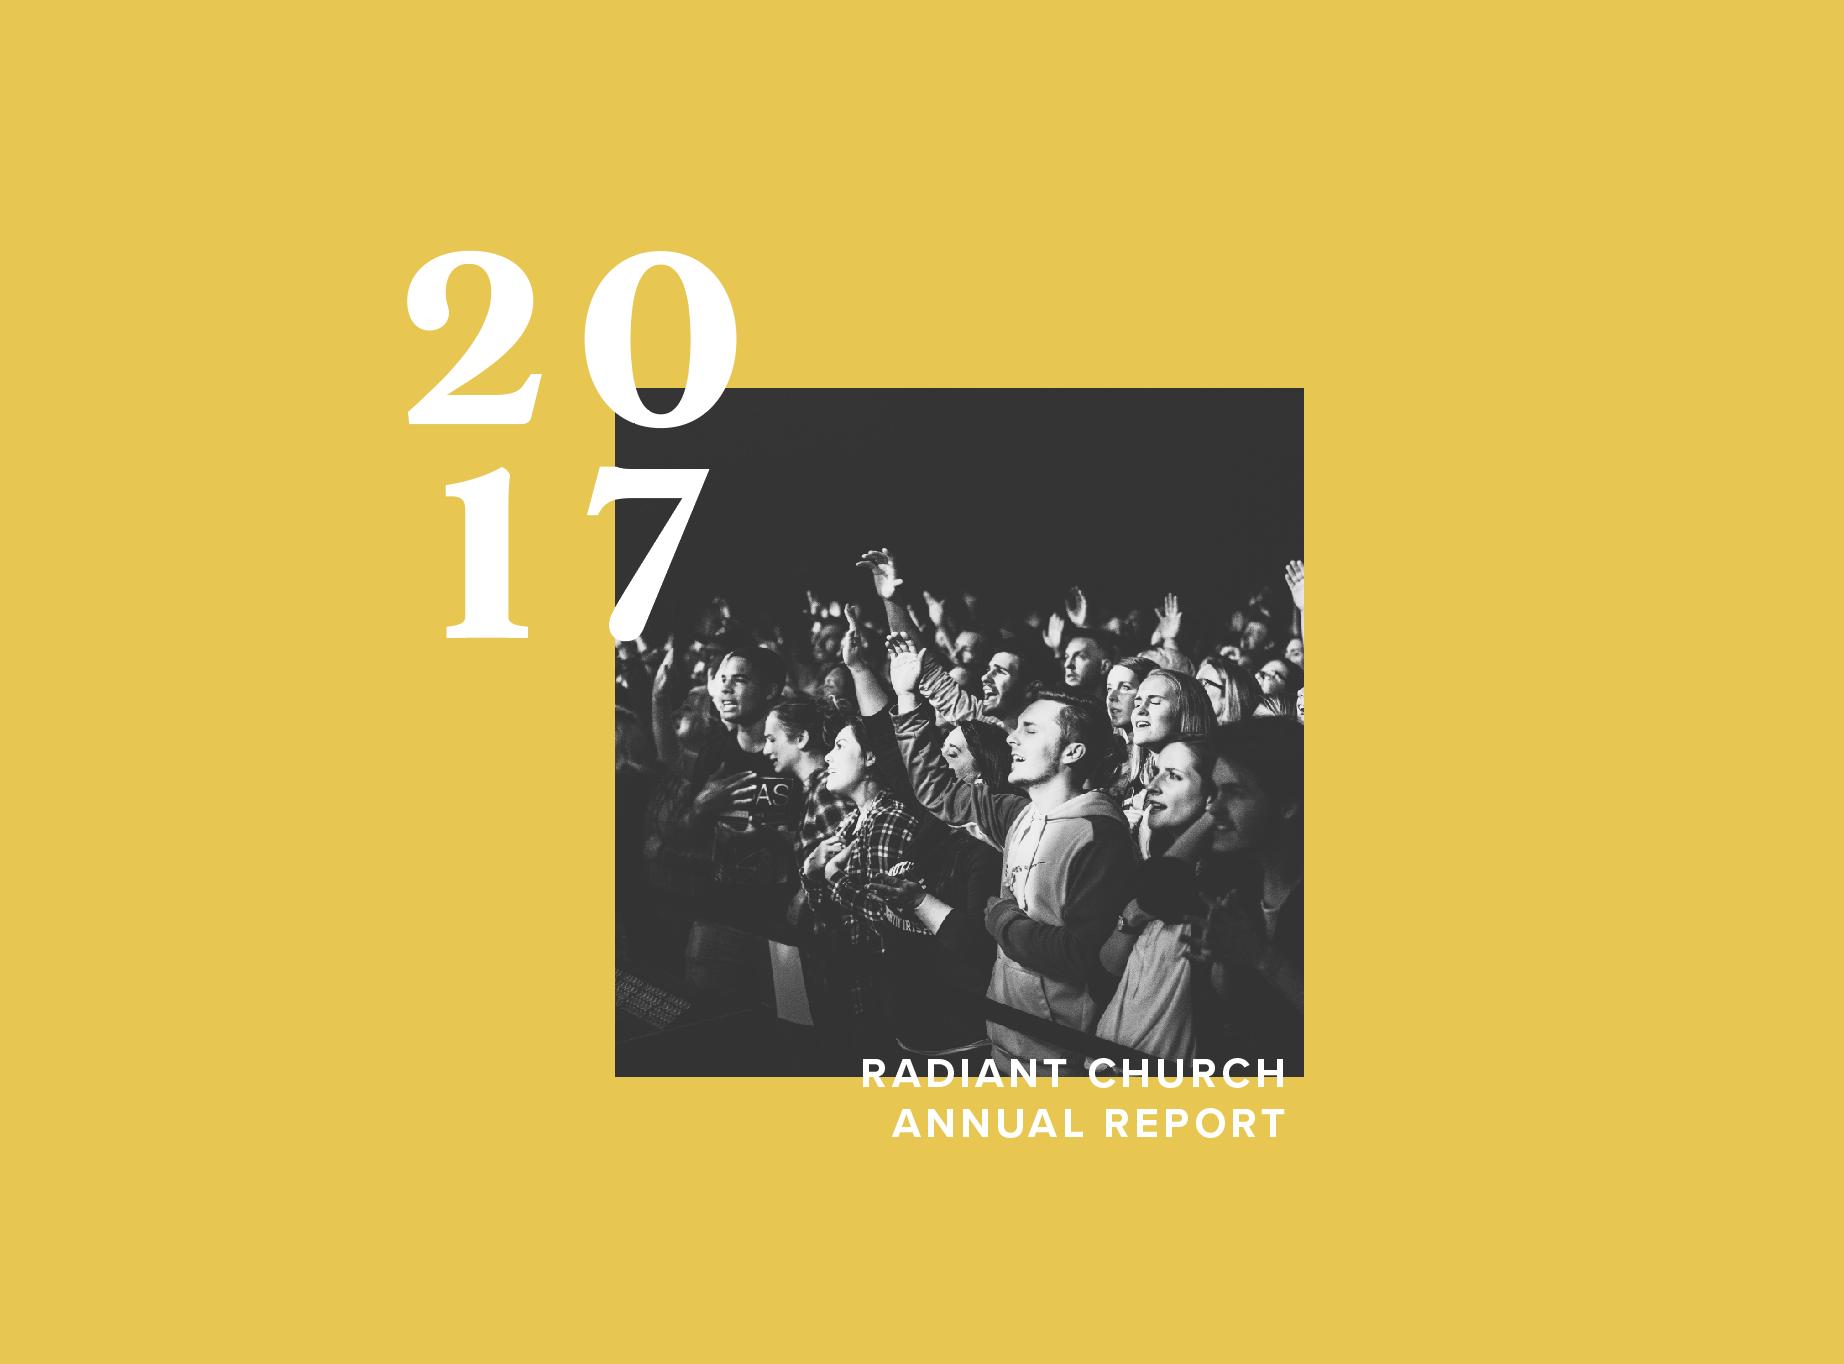 Radiant Annual Report 2017